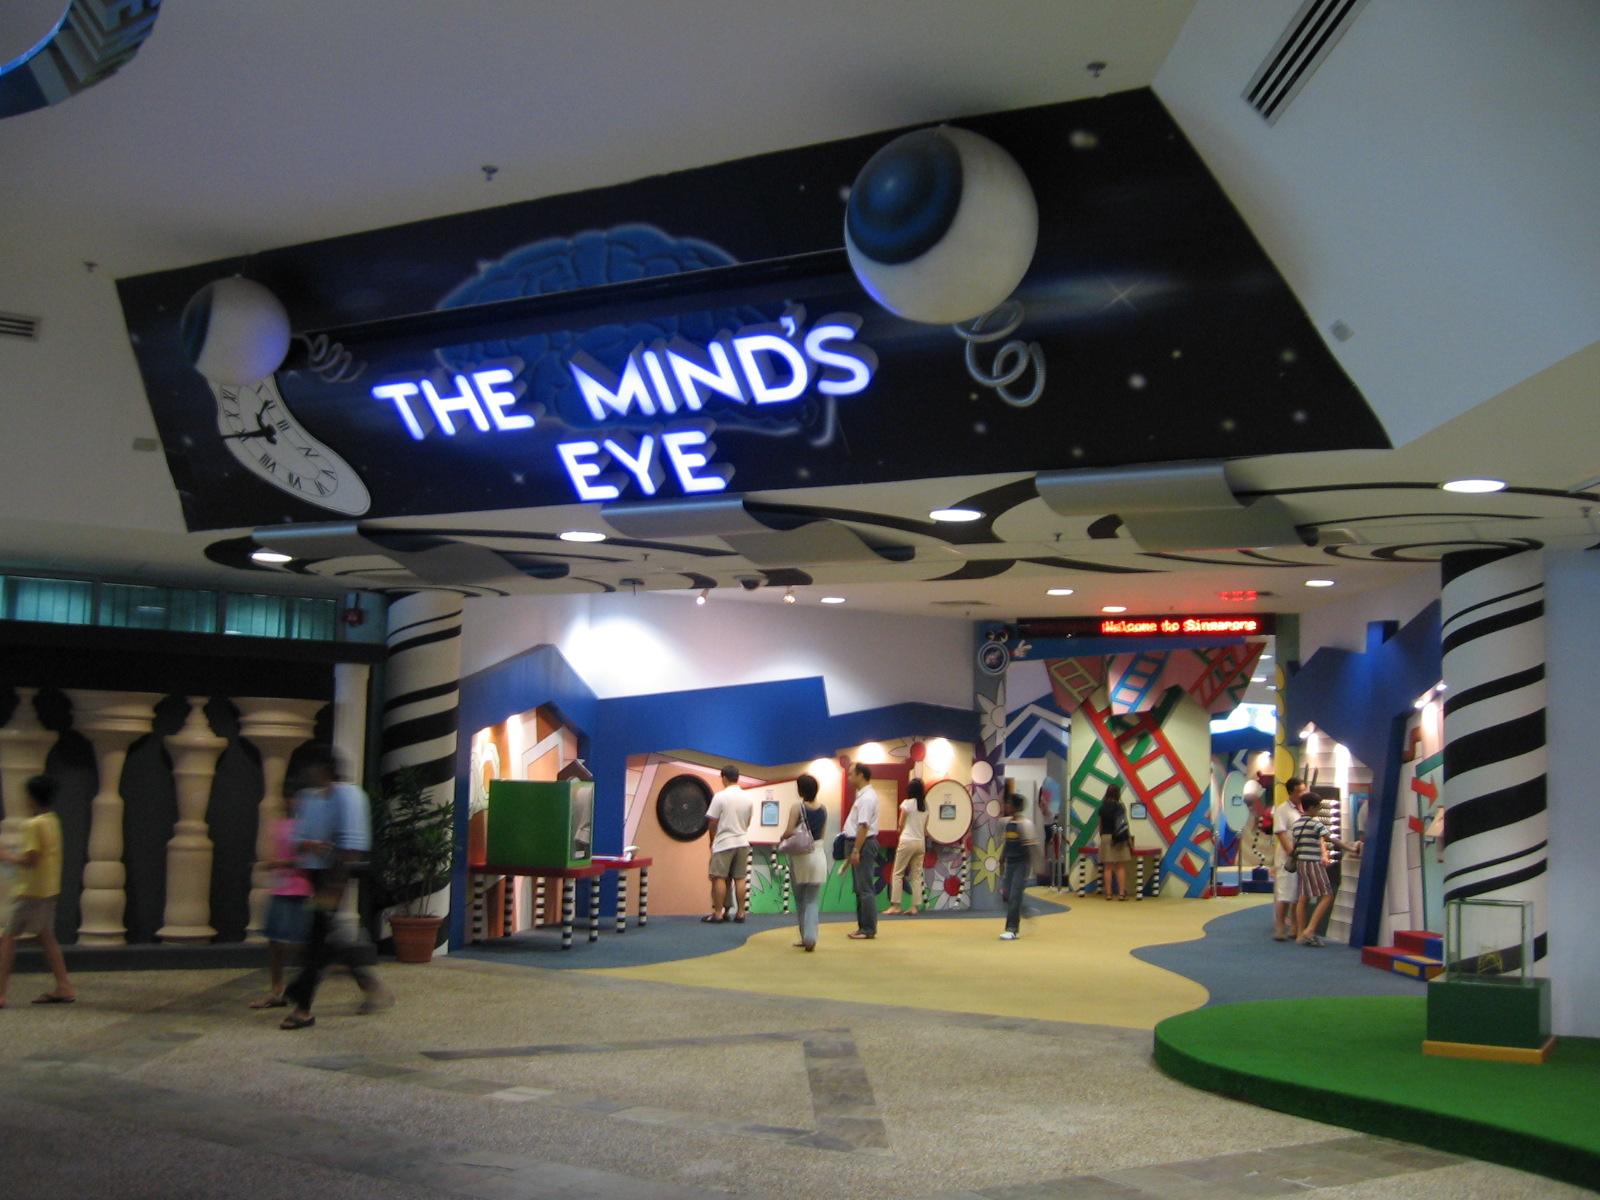 File:Singapore Science Centre 13, Jul 06.JPG - Wikipedia, the free ...